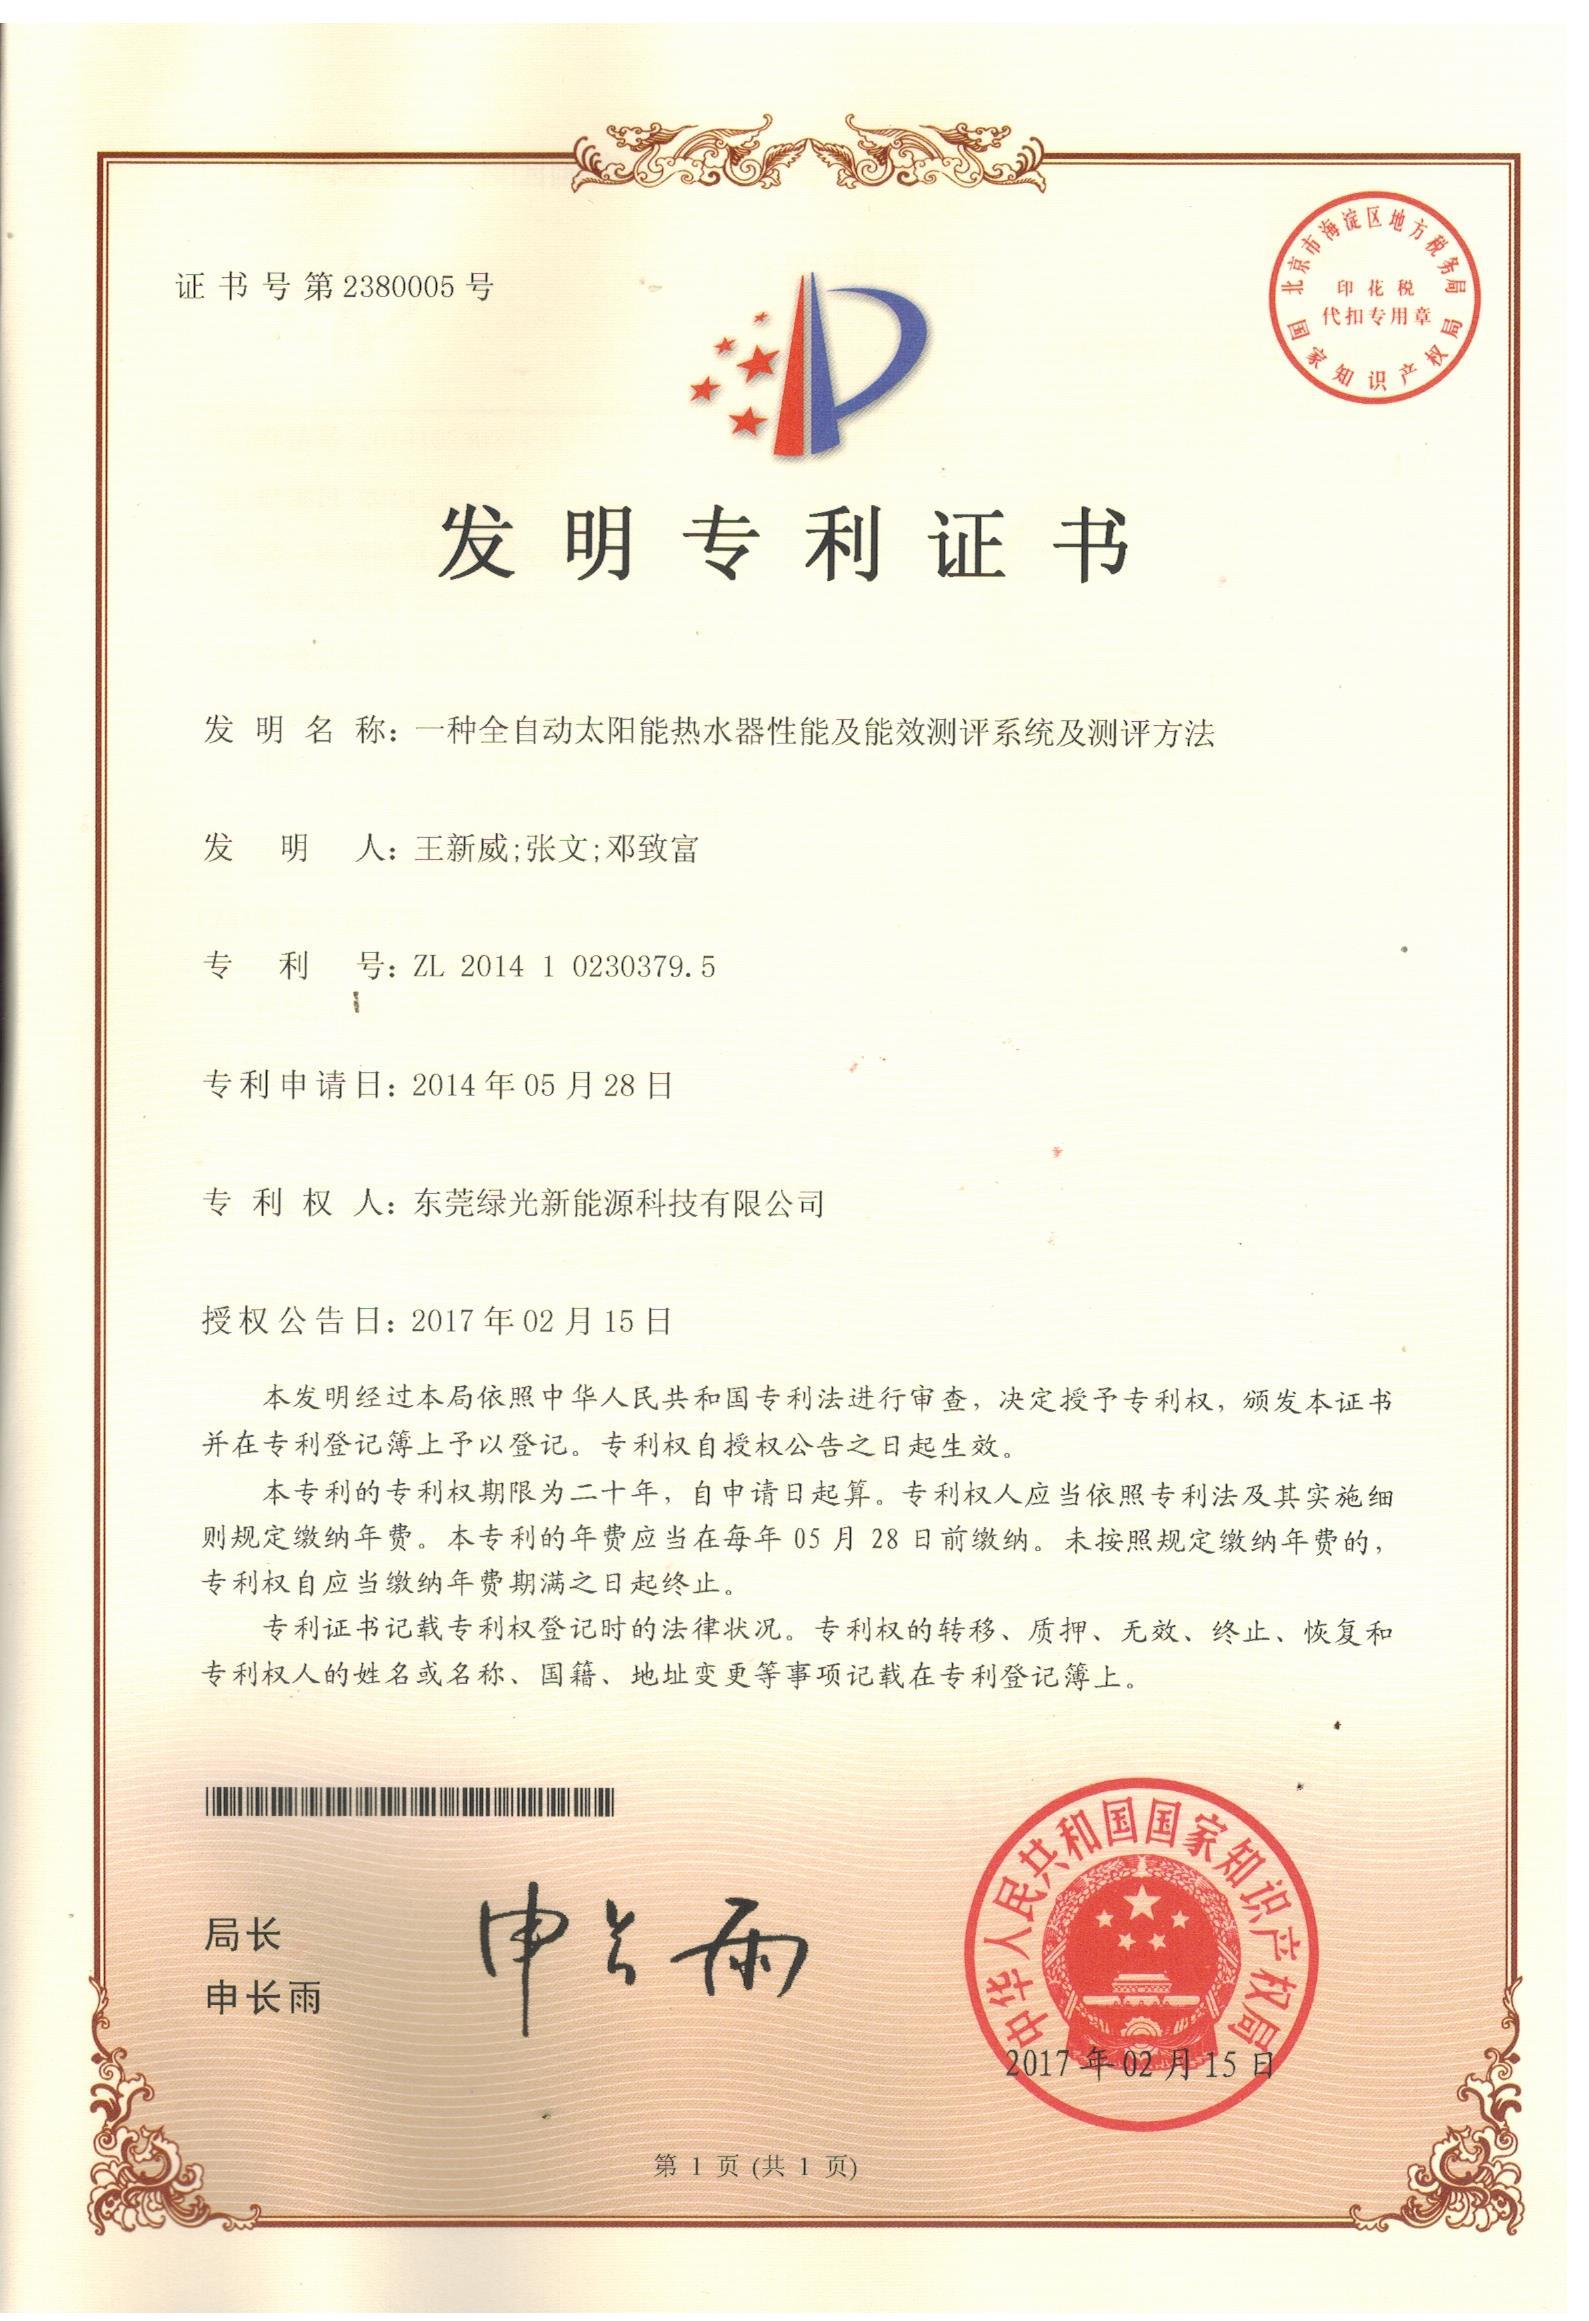 发明zhuan利zheng